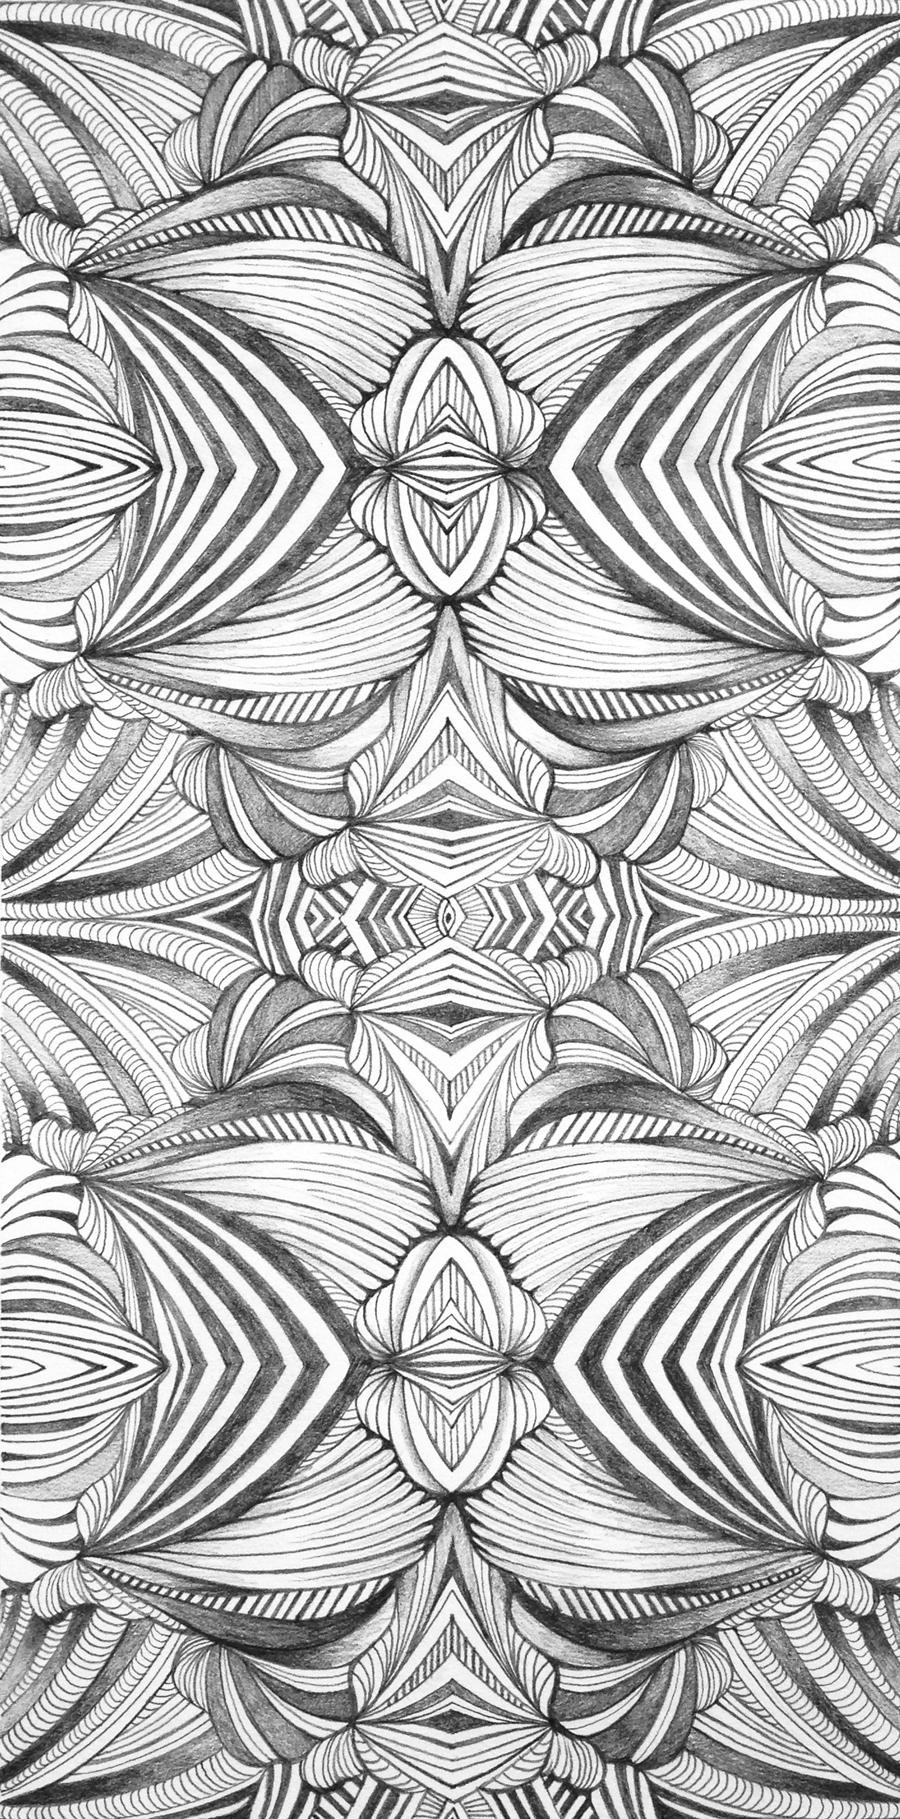 Vaulted Tessellation